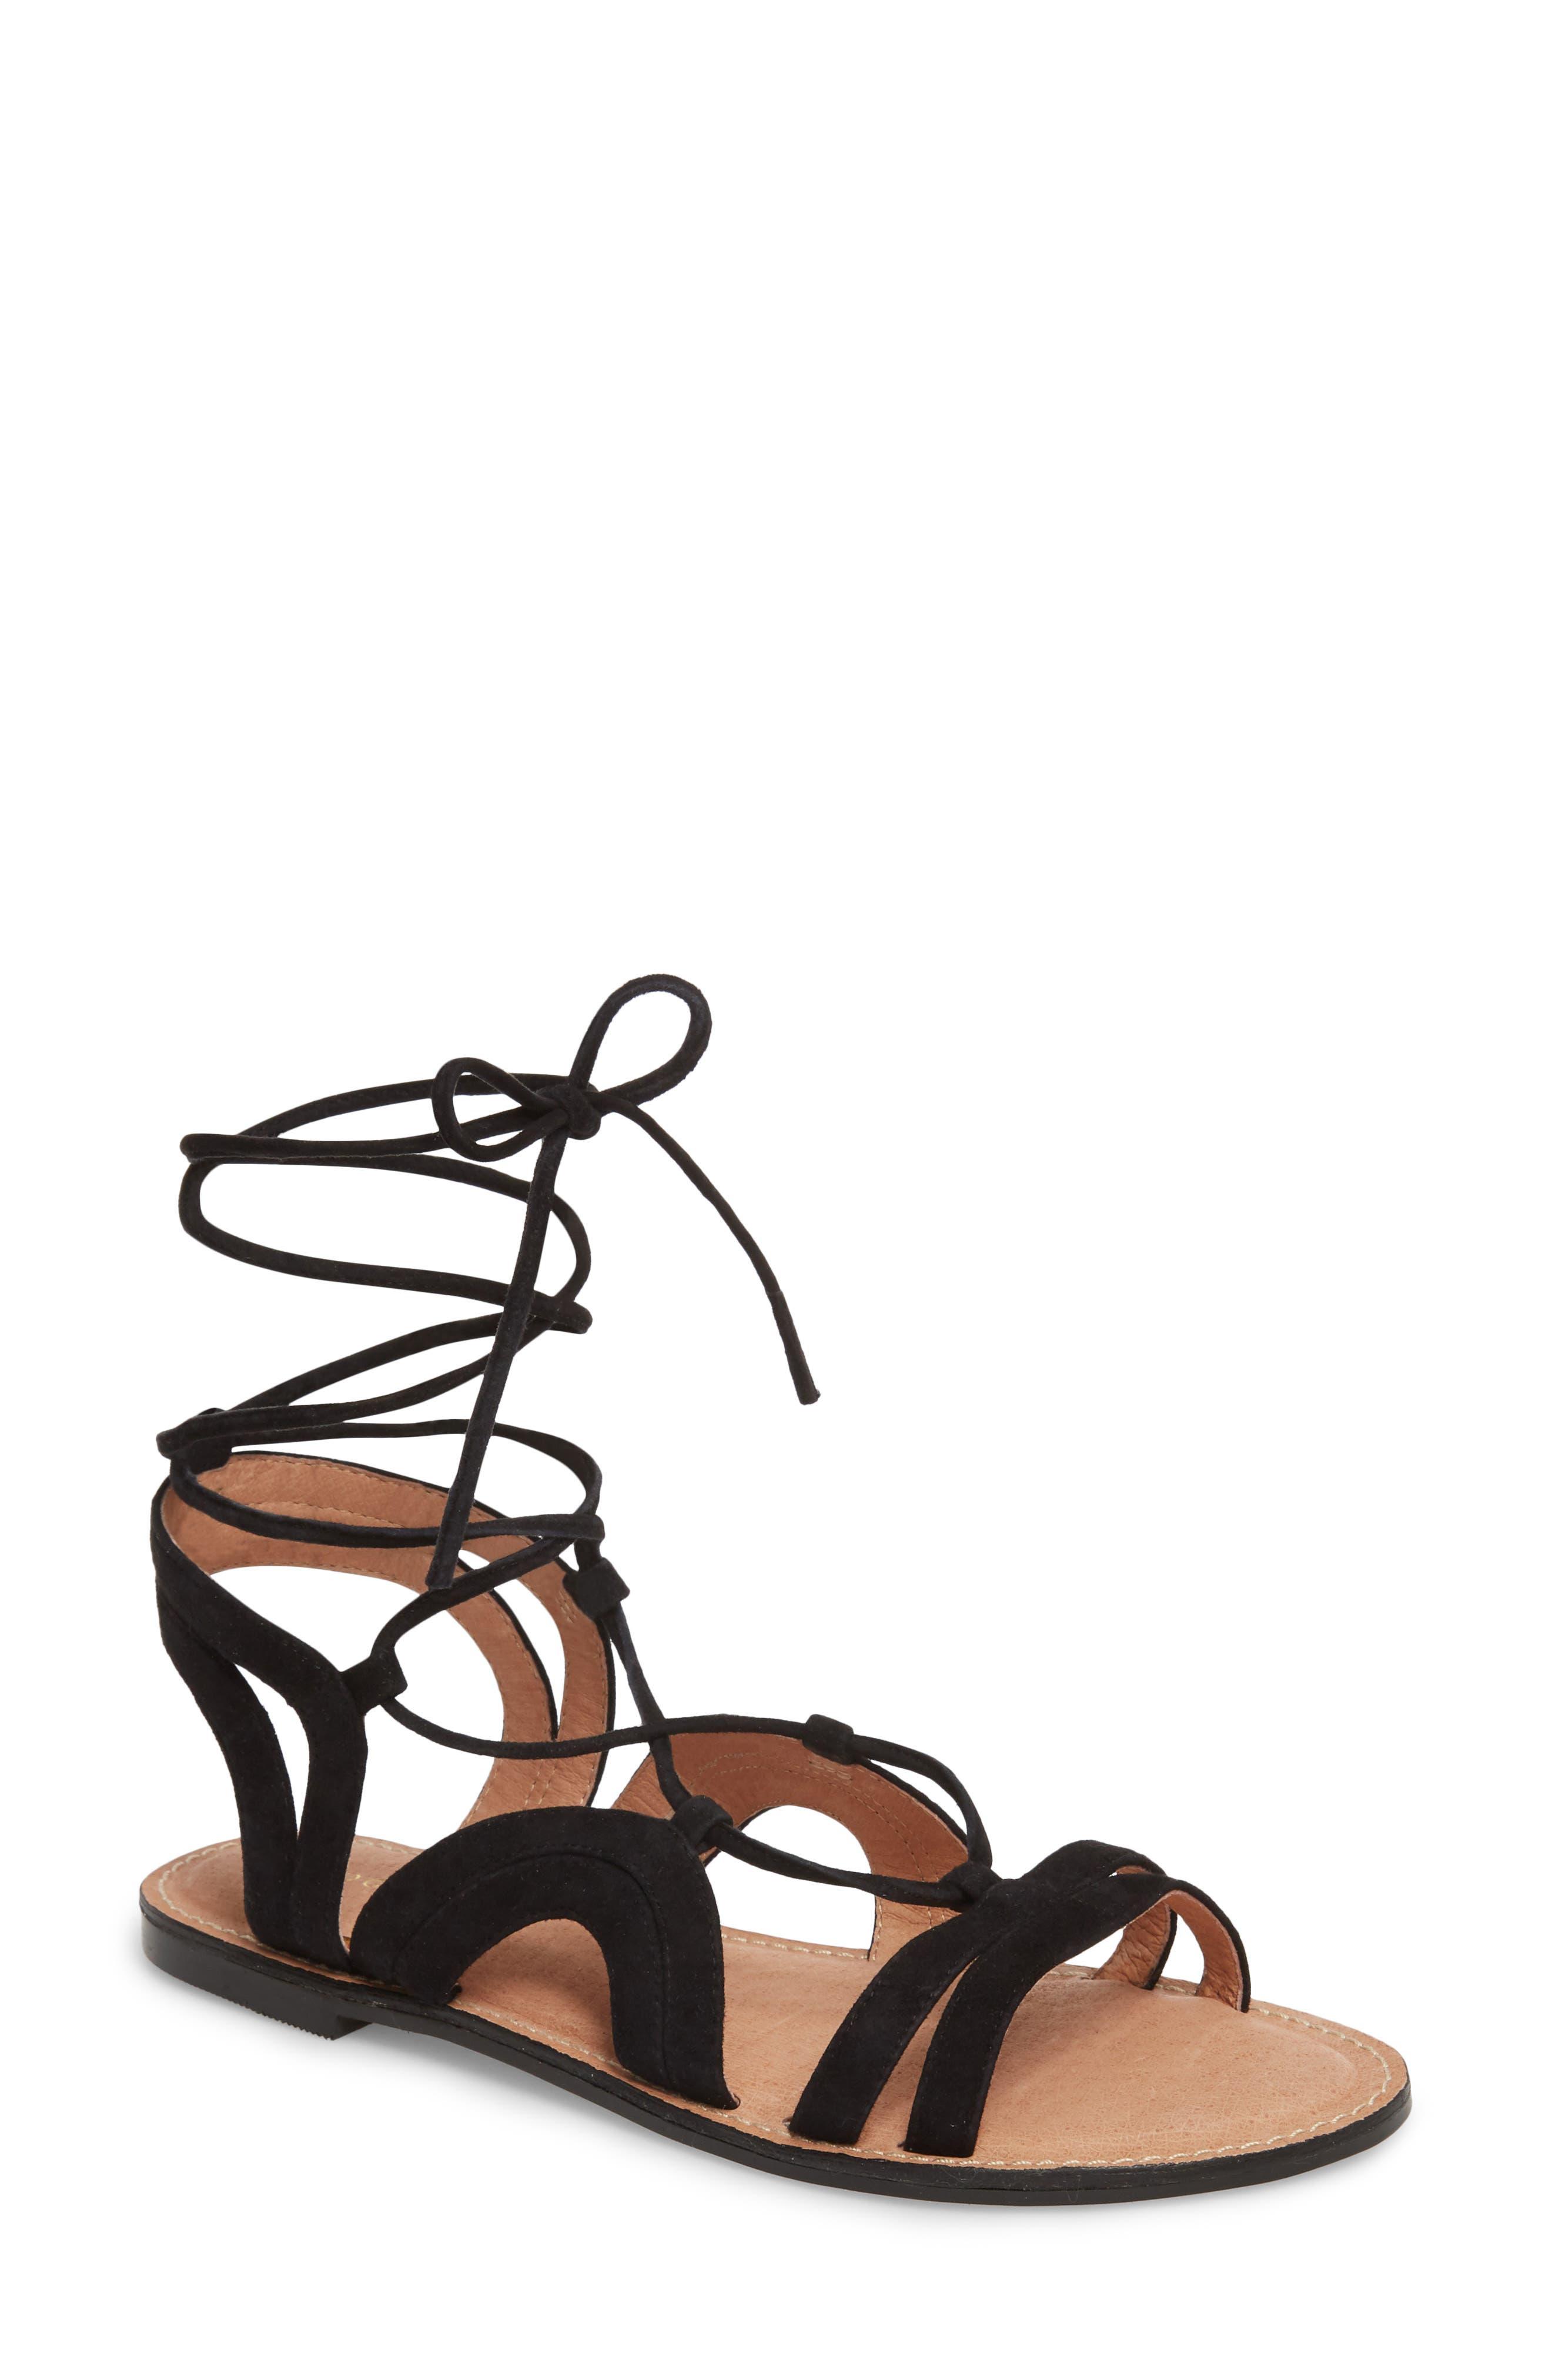 Lilian Gladiator Sandal,                         Main,                         color,